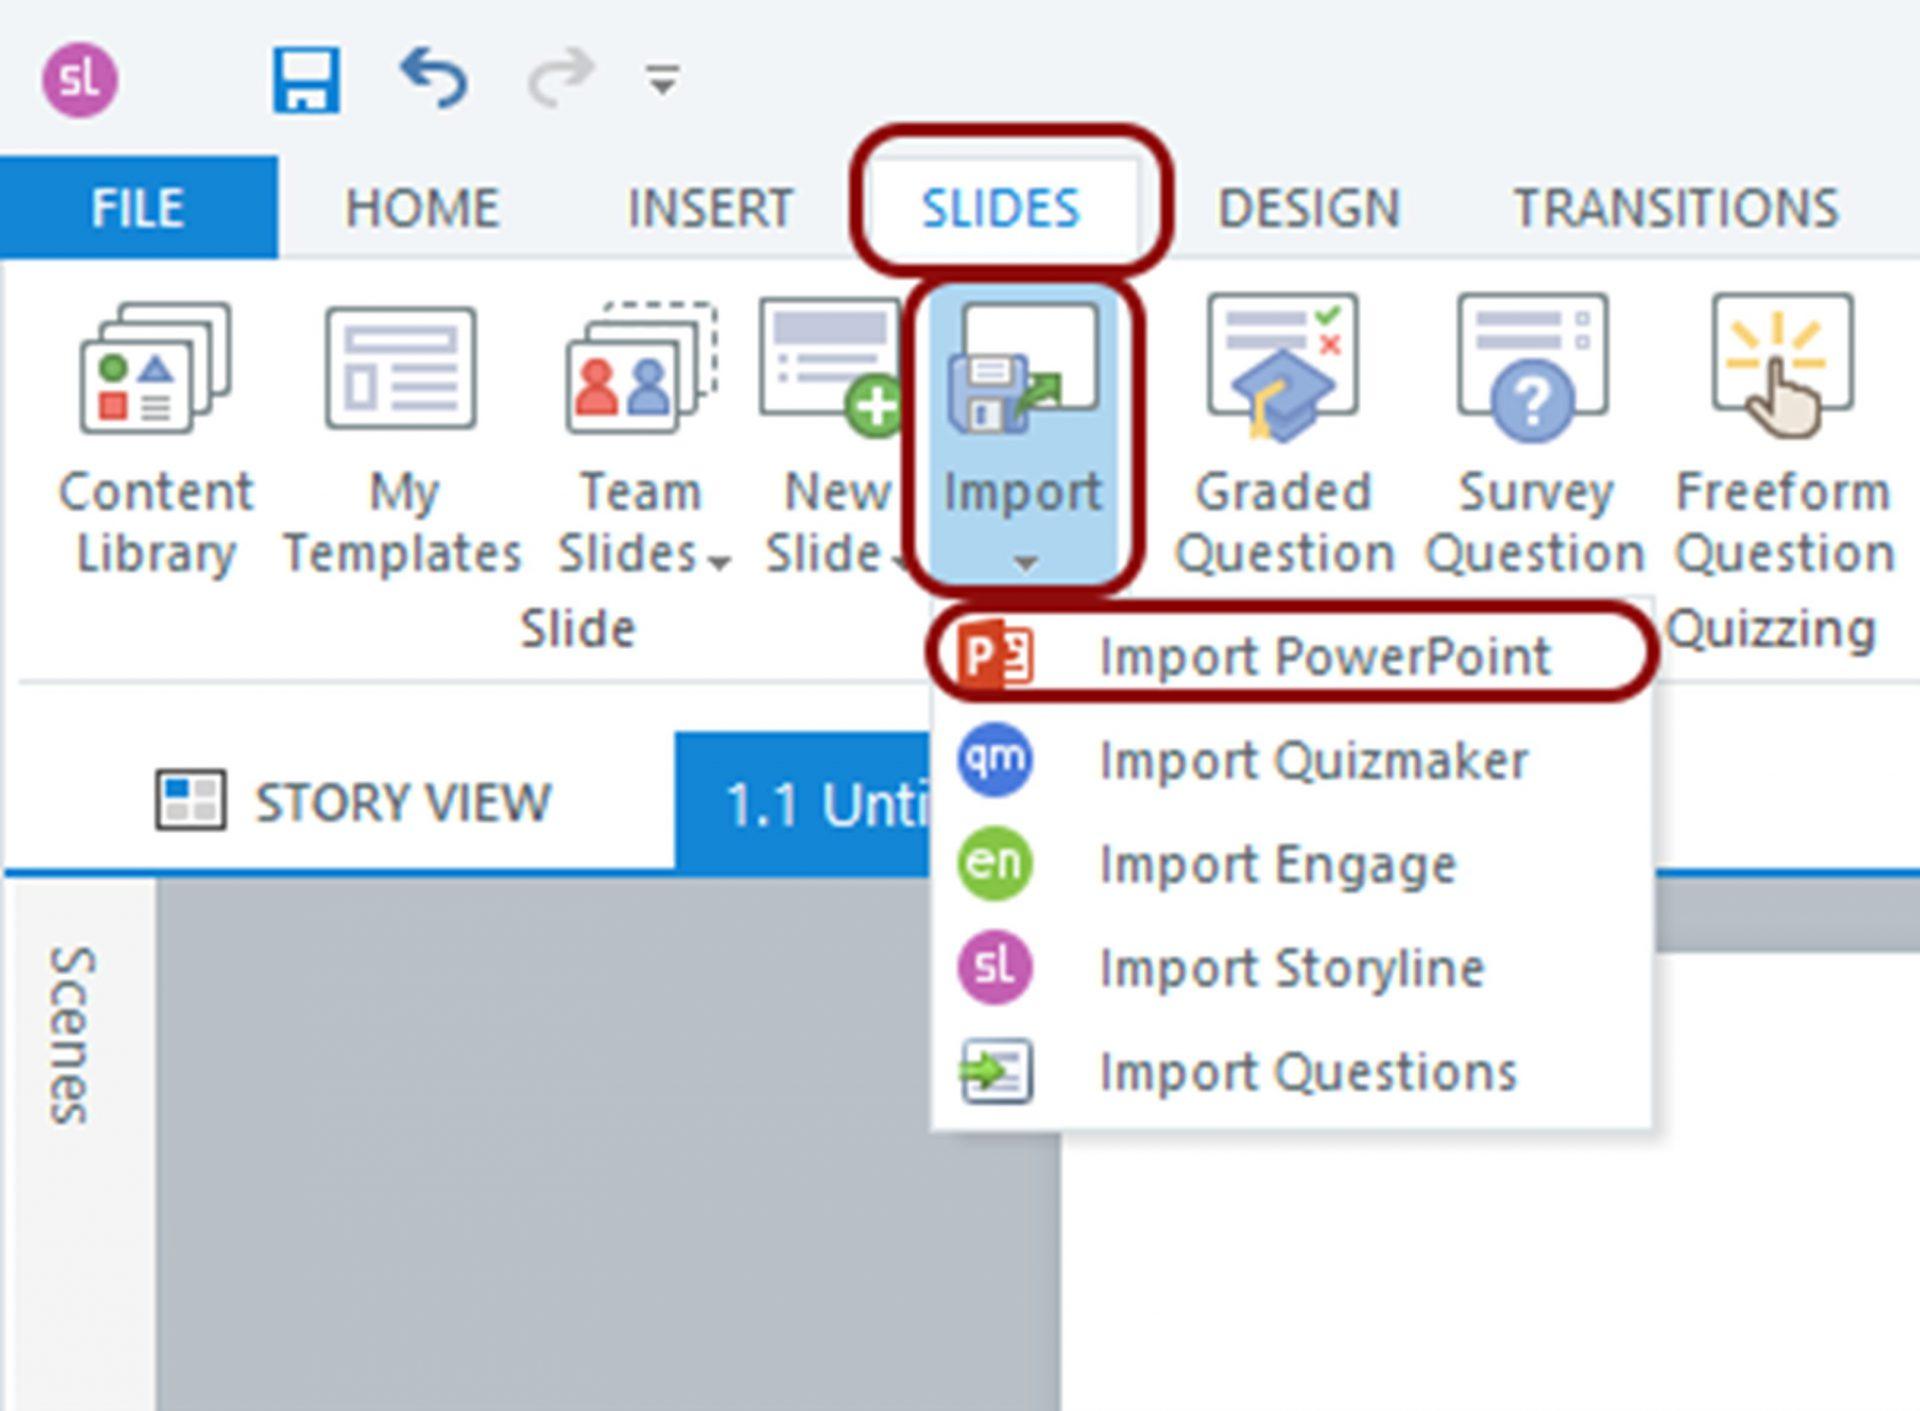 Import PowerPoint